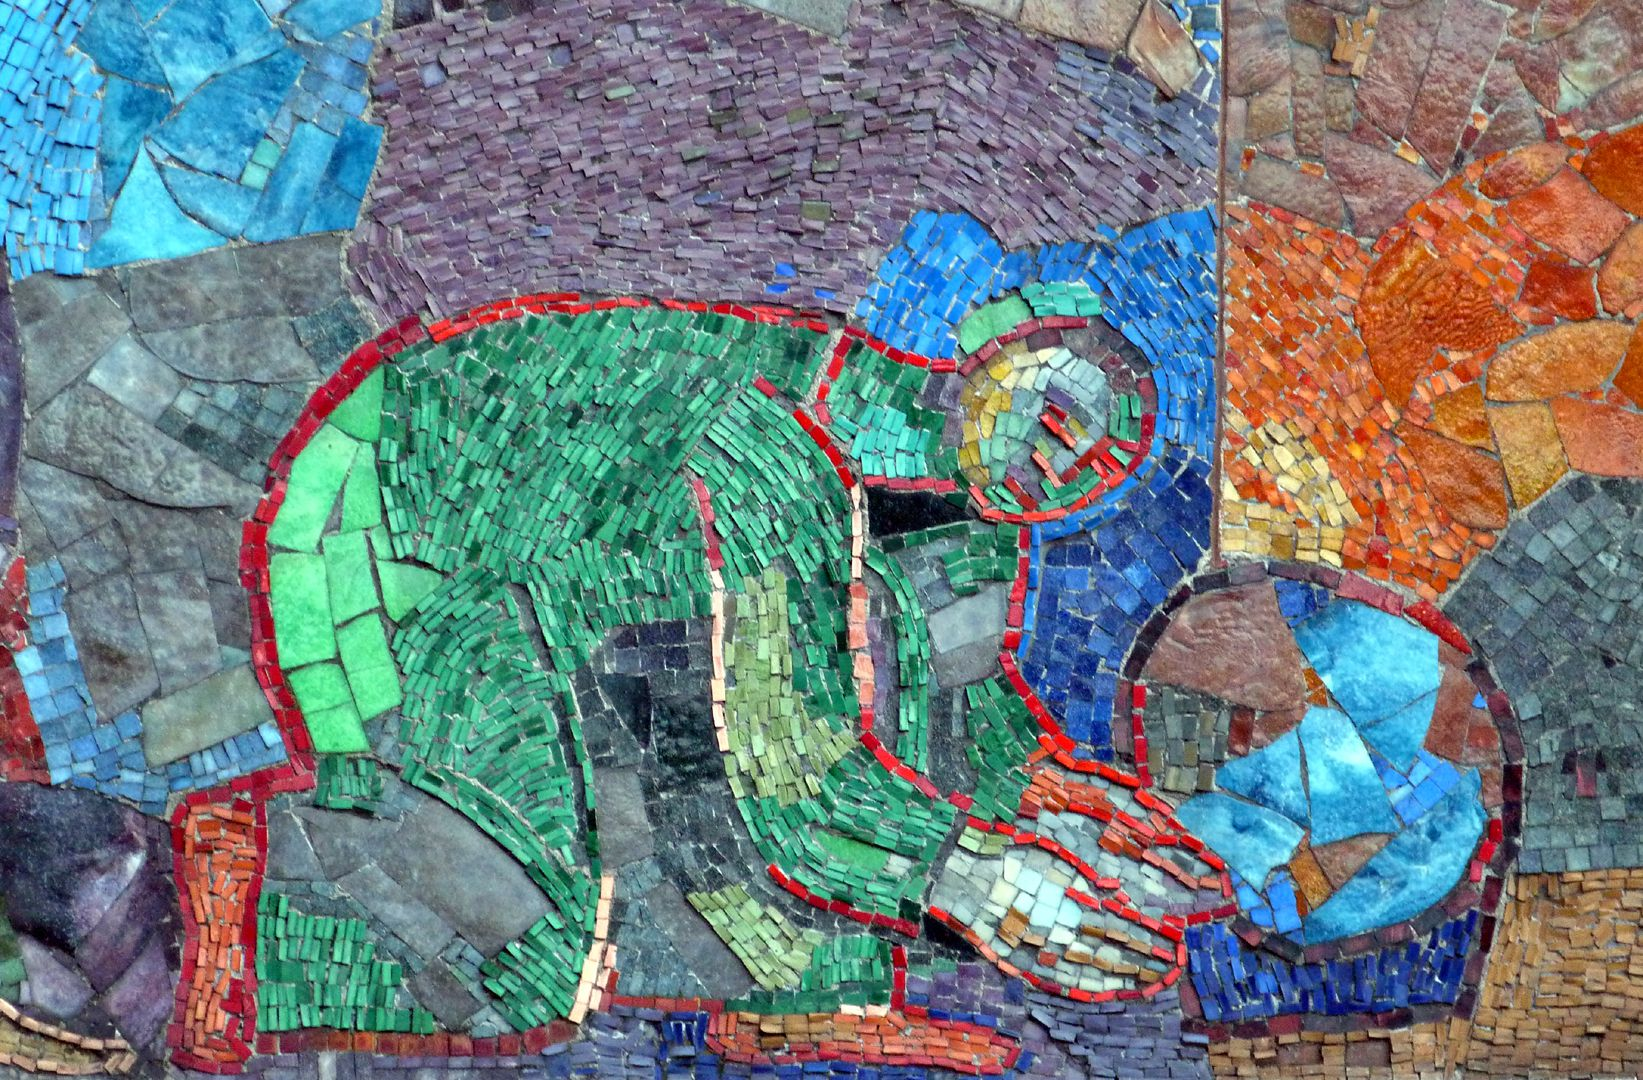 Mosaik am Hauptmarkt in Nürnberg Warenanbieter